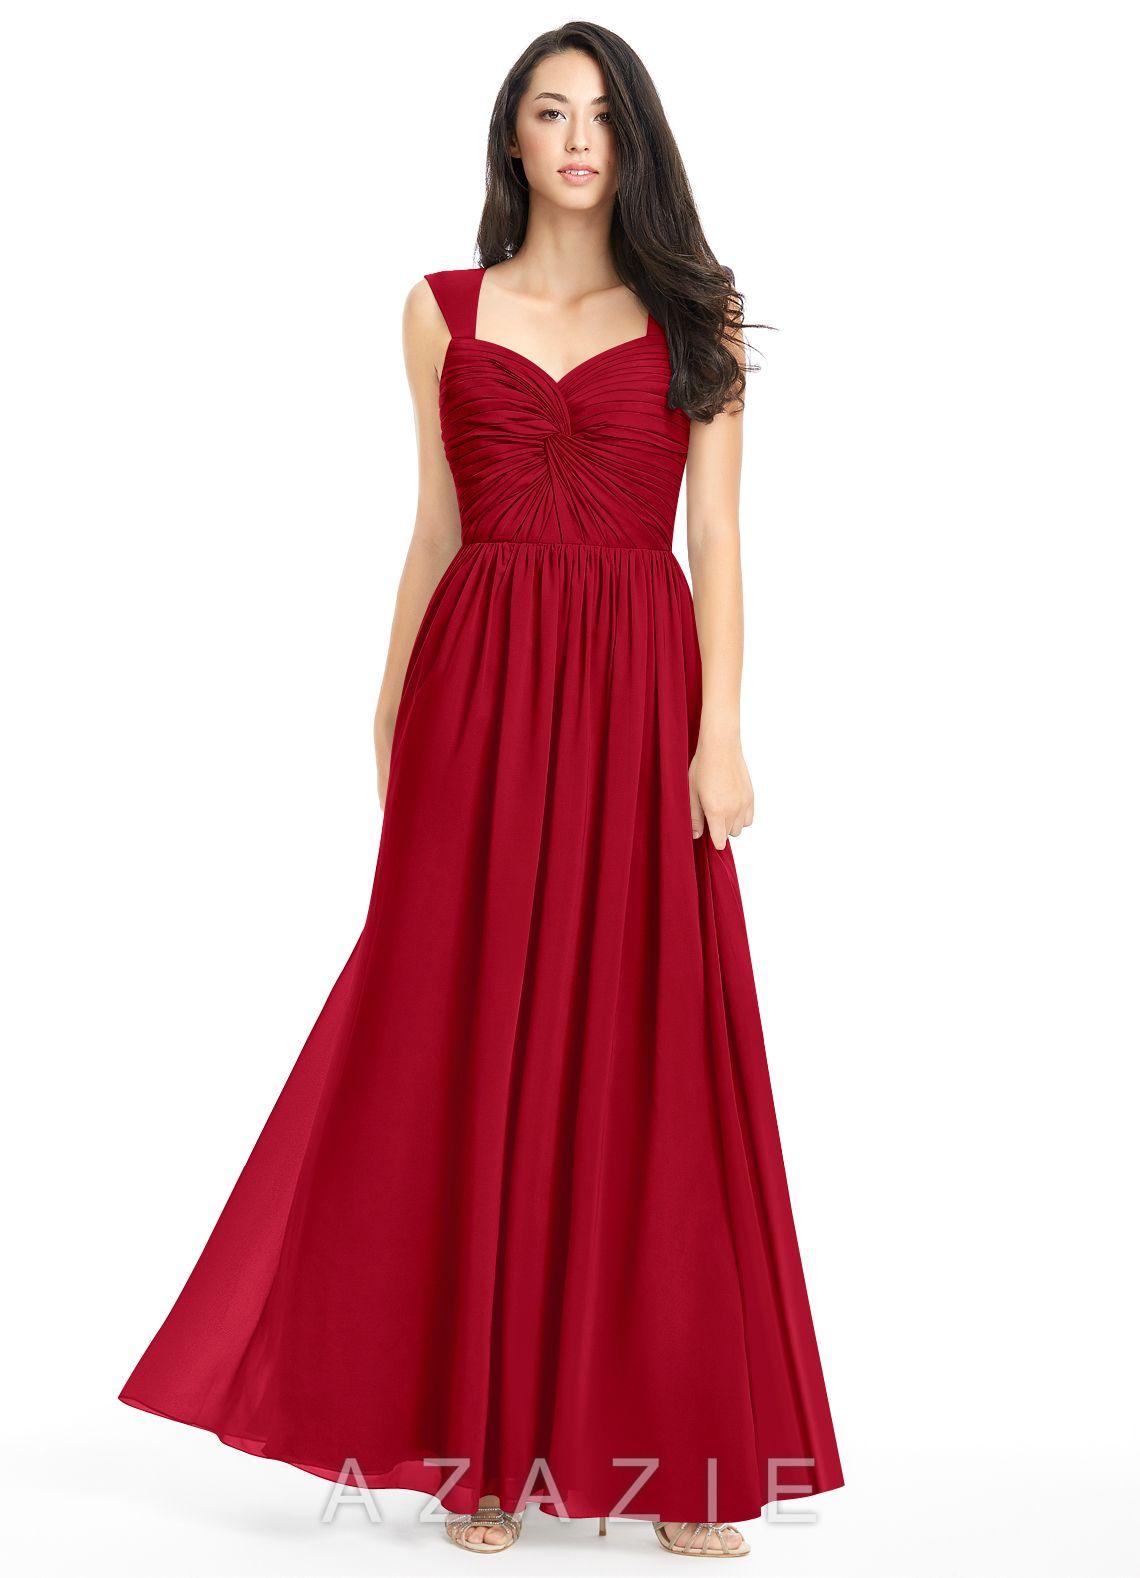 Amya bridesmaid dress shops colors and the ojays amya bridesmaid dress ombrellifo Images